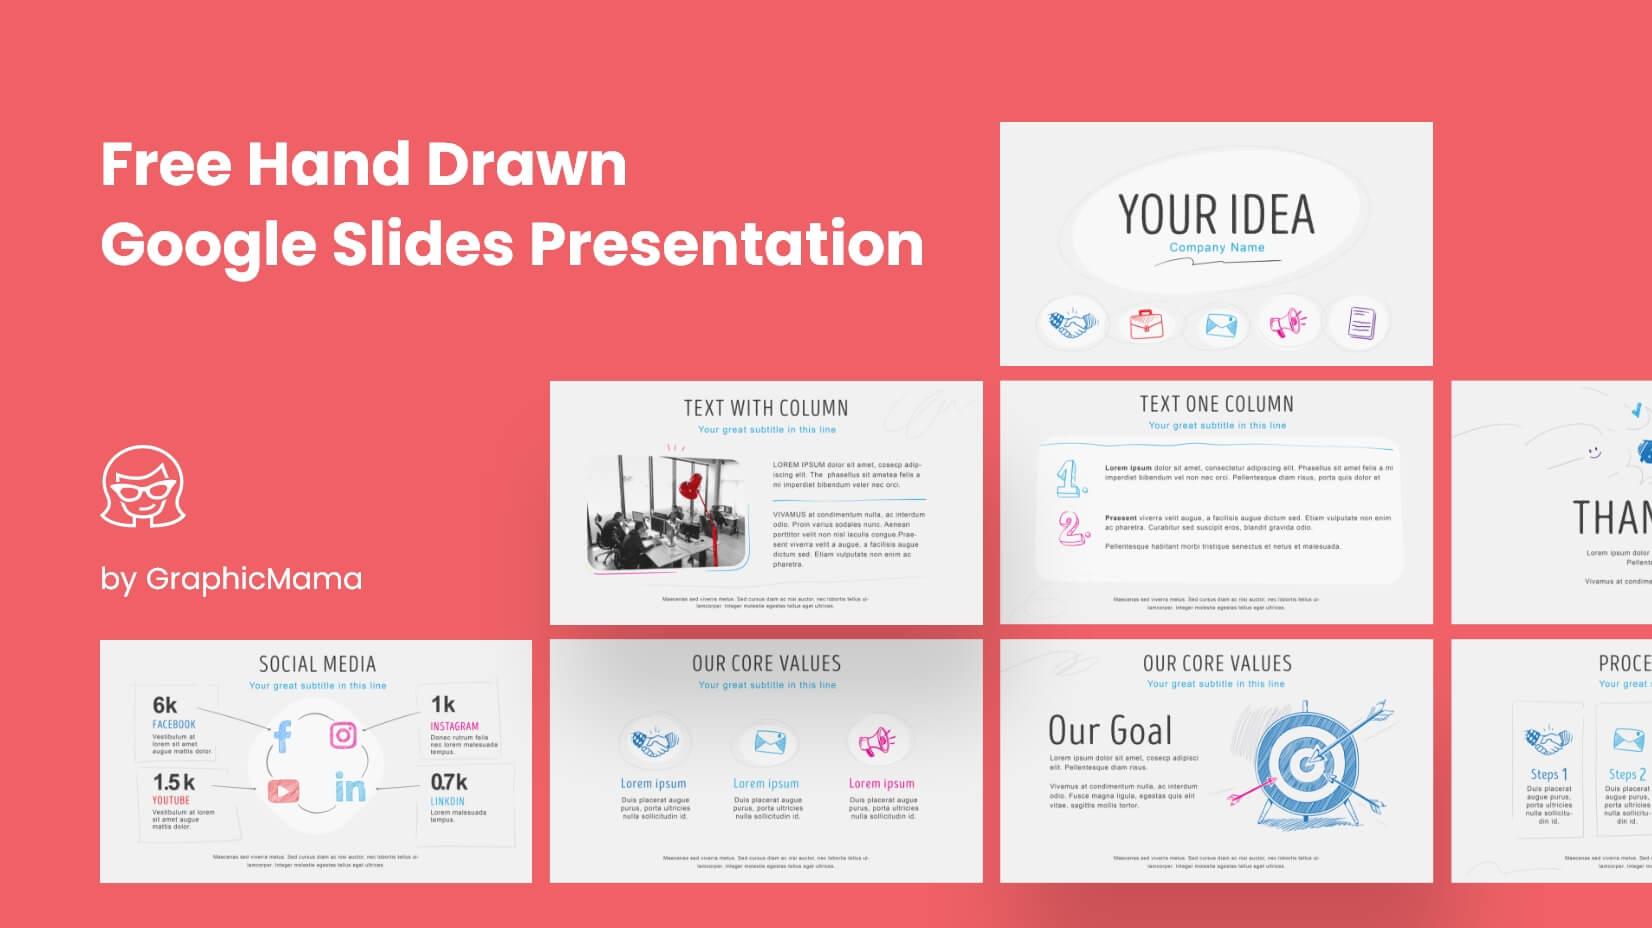 Free-Hand-Drawn-Google-Slides-Presentation.